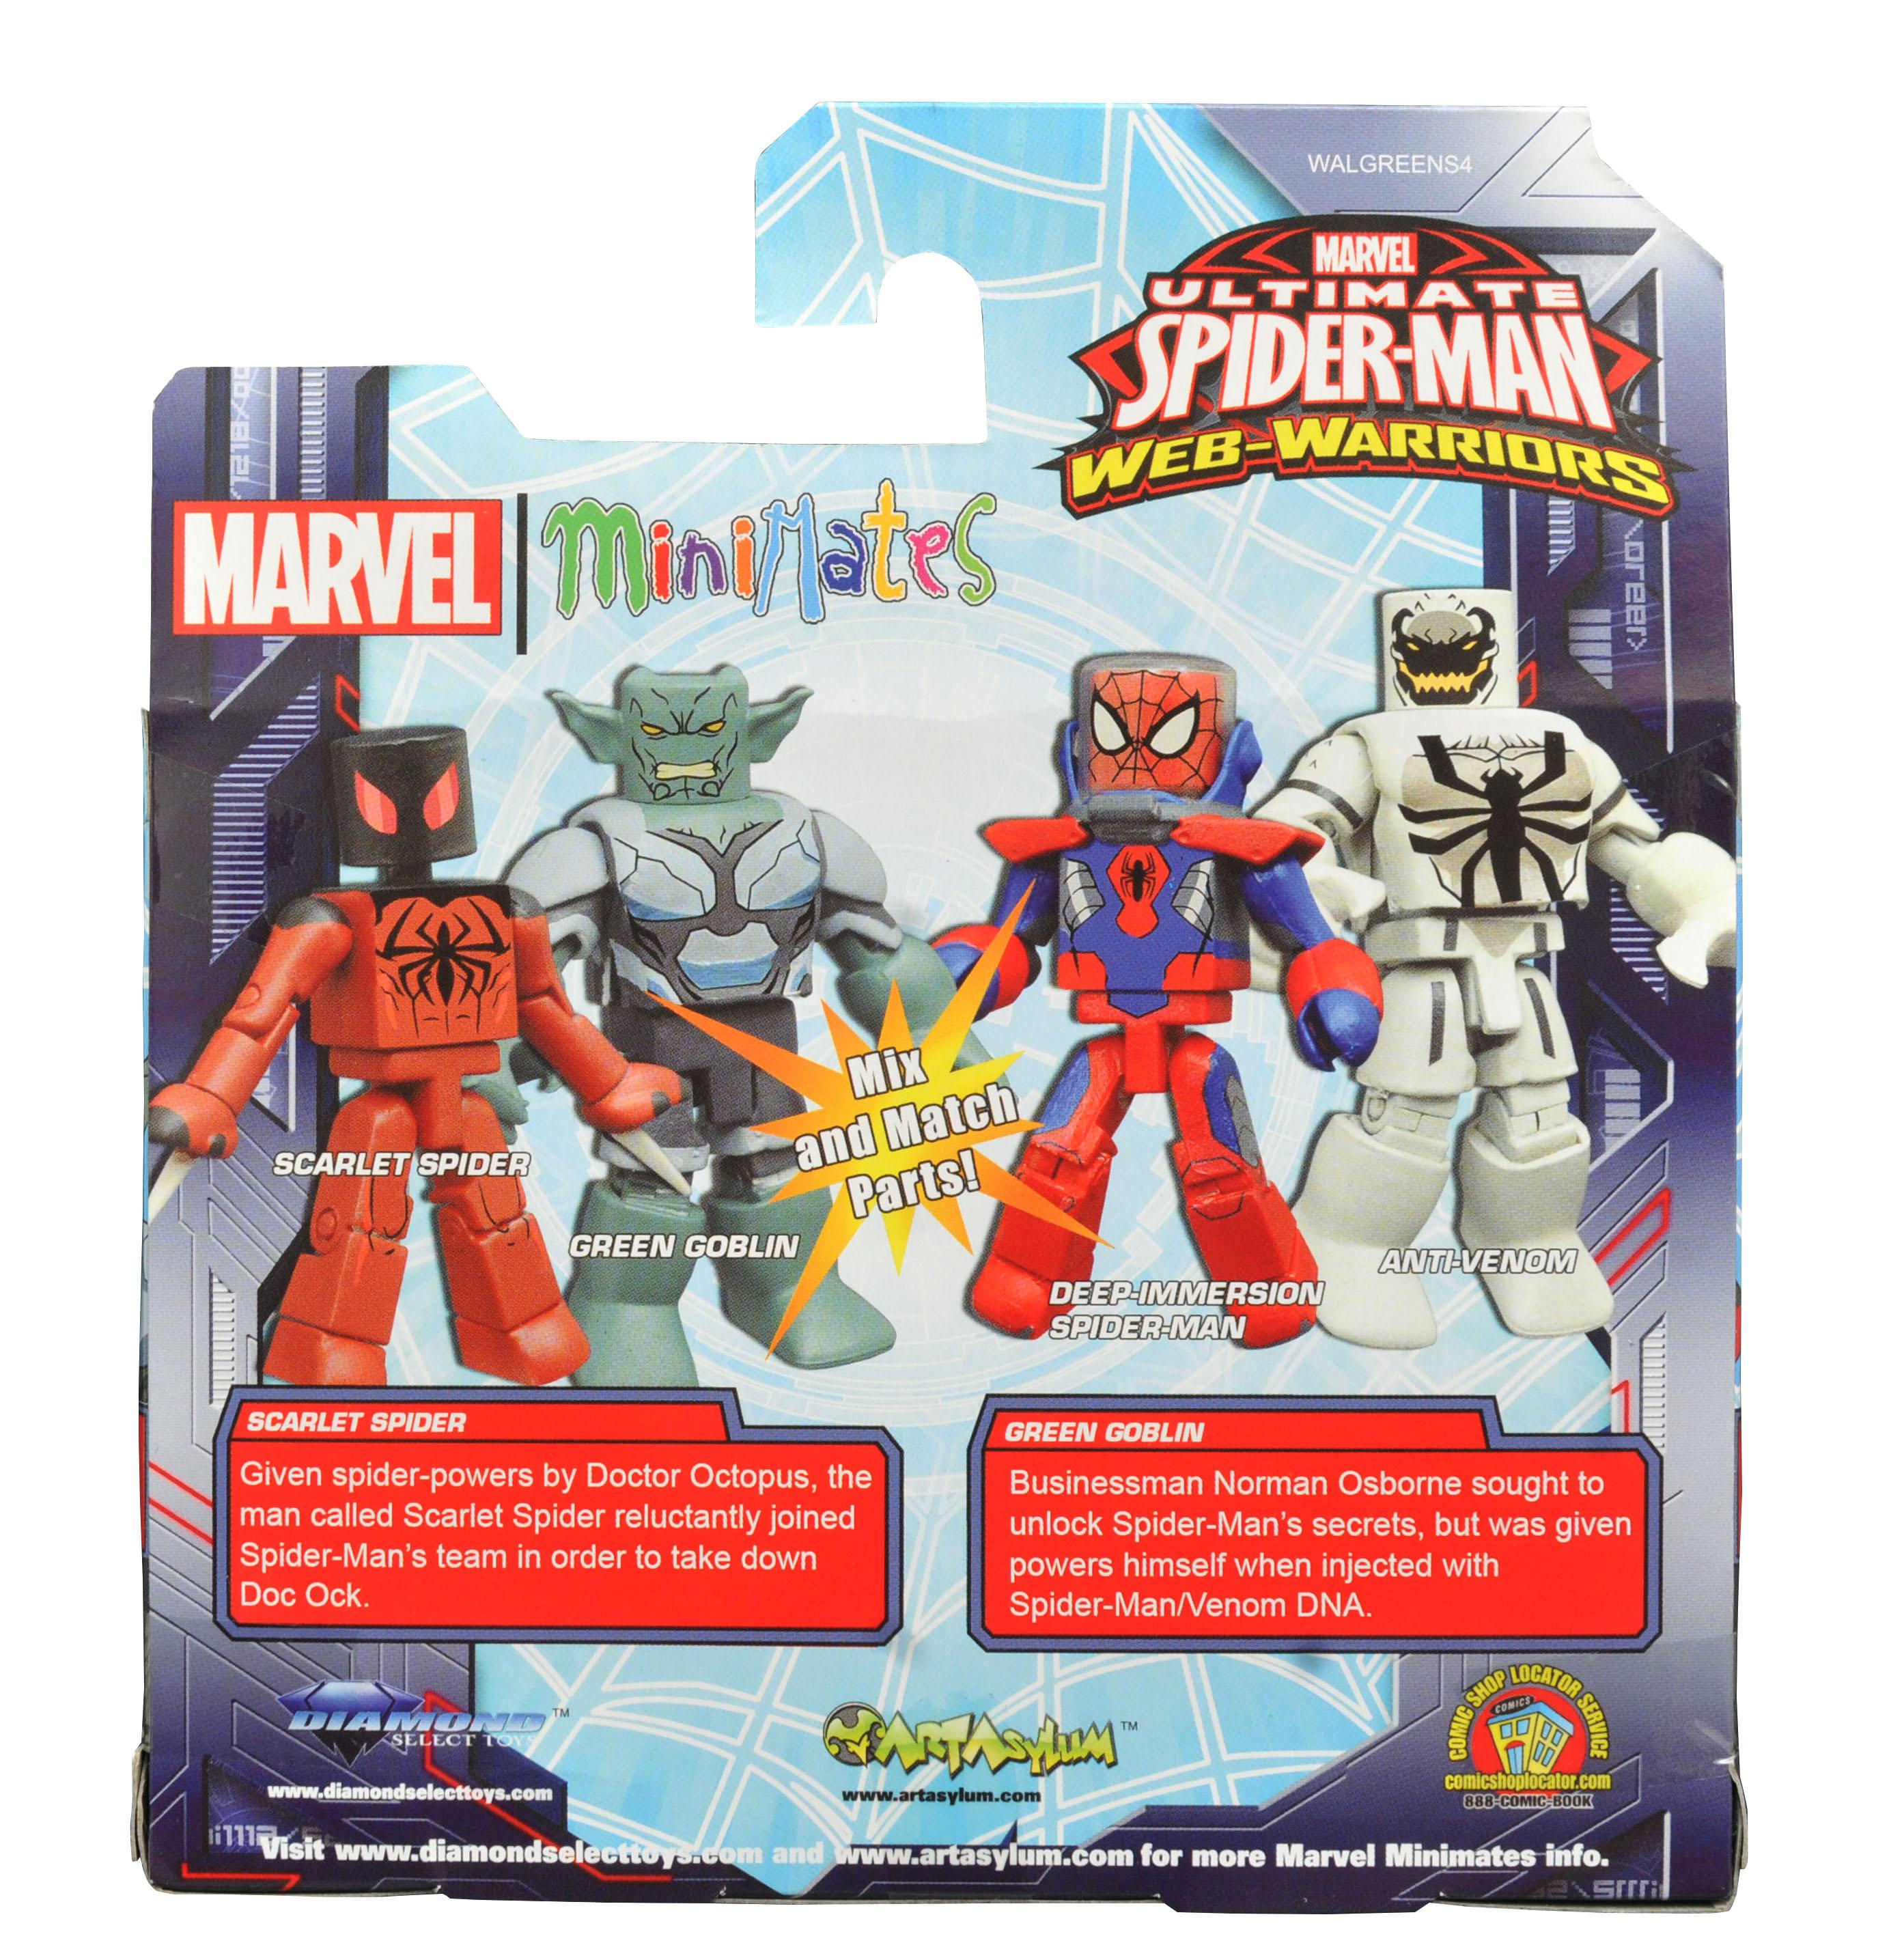 Marvel Minimates Walgreens Wave 4 Web Warriors Deep Immersion Spider-Man